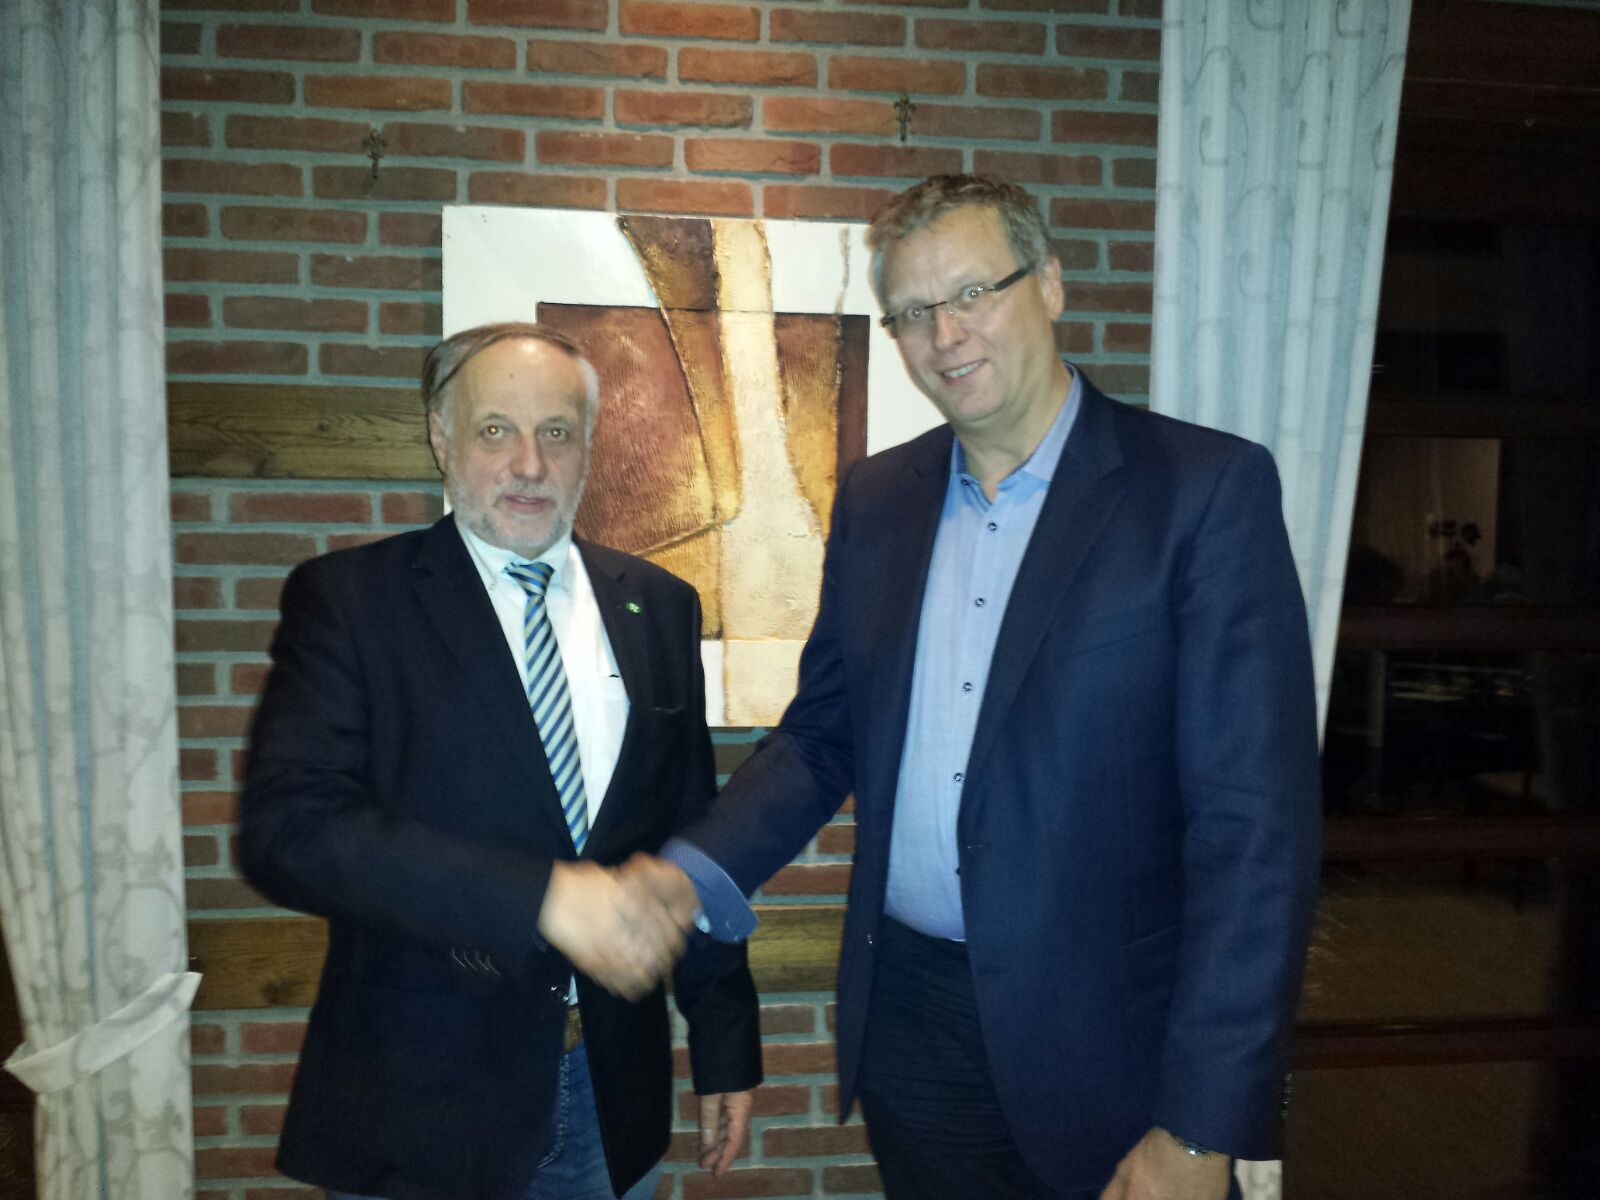 Der bisherige Obermeister Ludger Gausling (l.) gratuliert dem neuen Obermeister Stefan Röring.